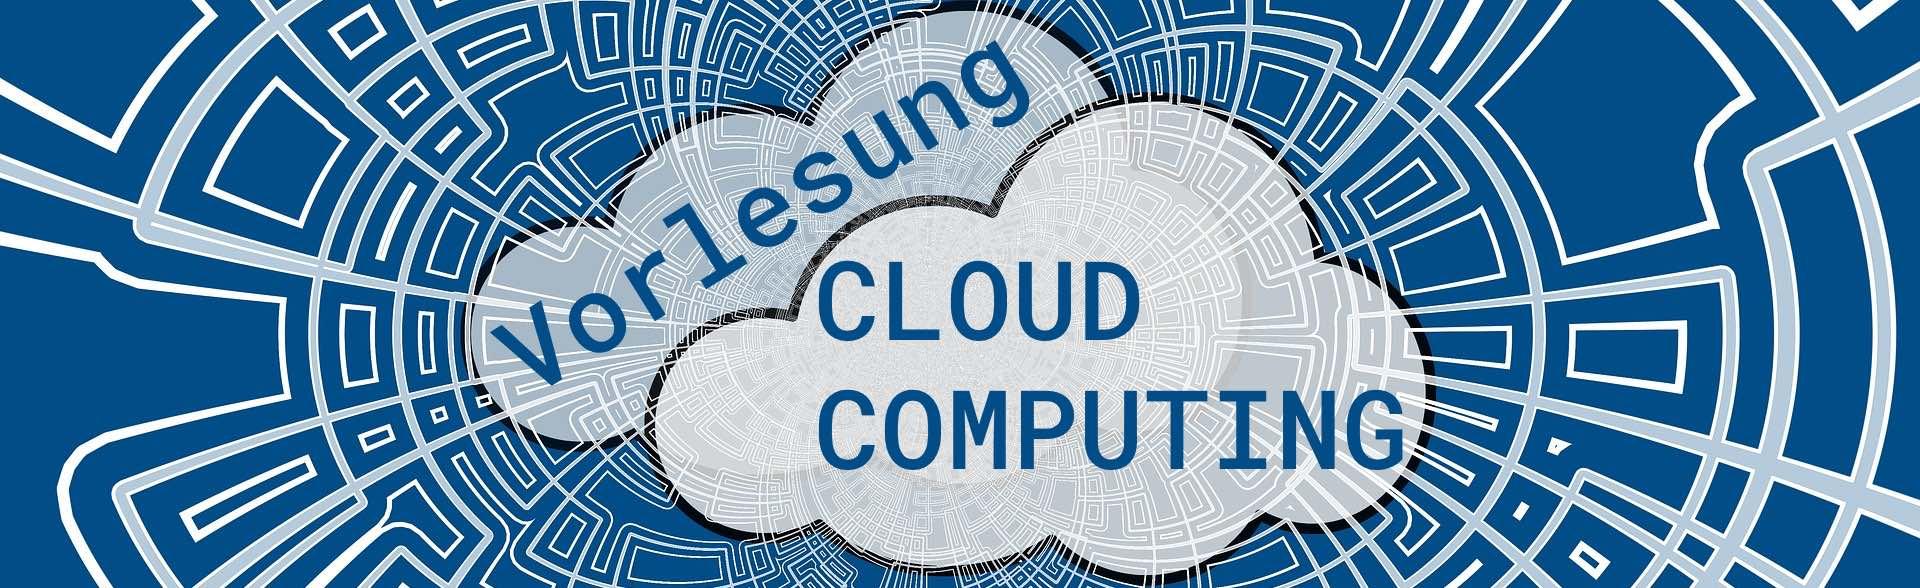 Vorlesung Cloud Computing